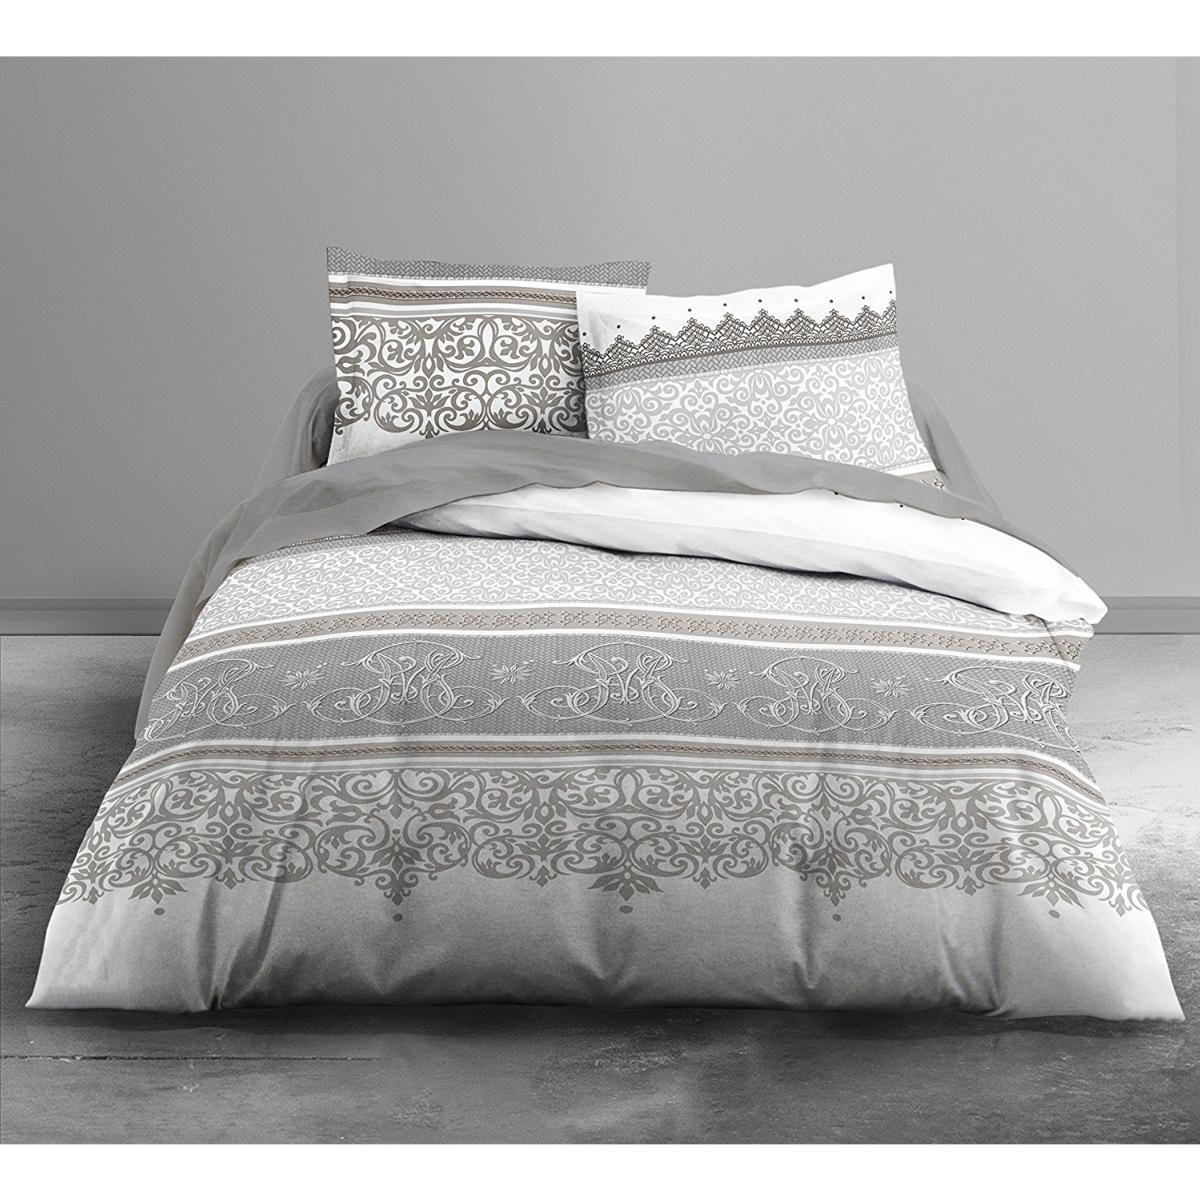 housse de couette baroco mawira j k markets. Black Bedroom Furniture Sets. Home Design Ideas